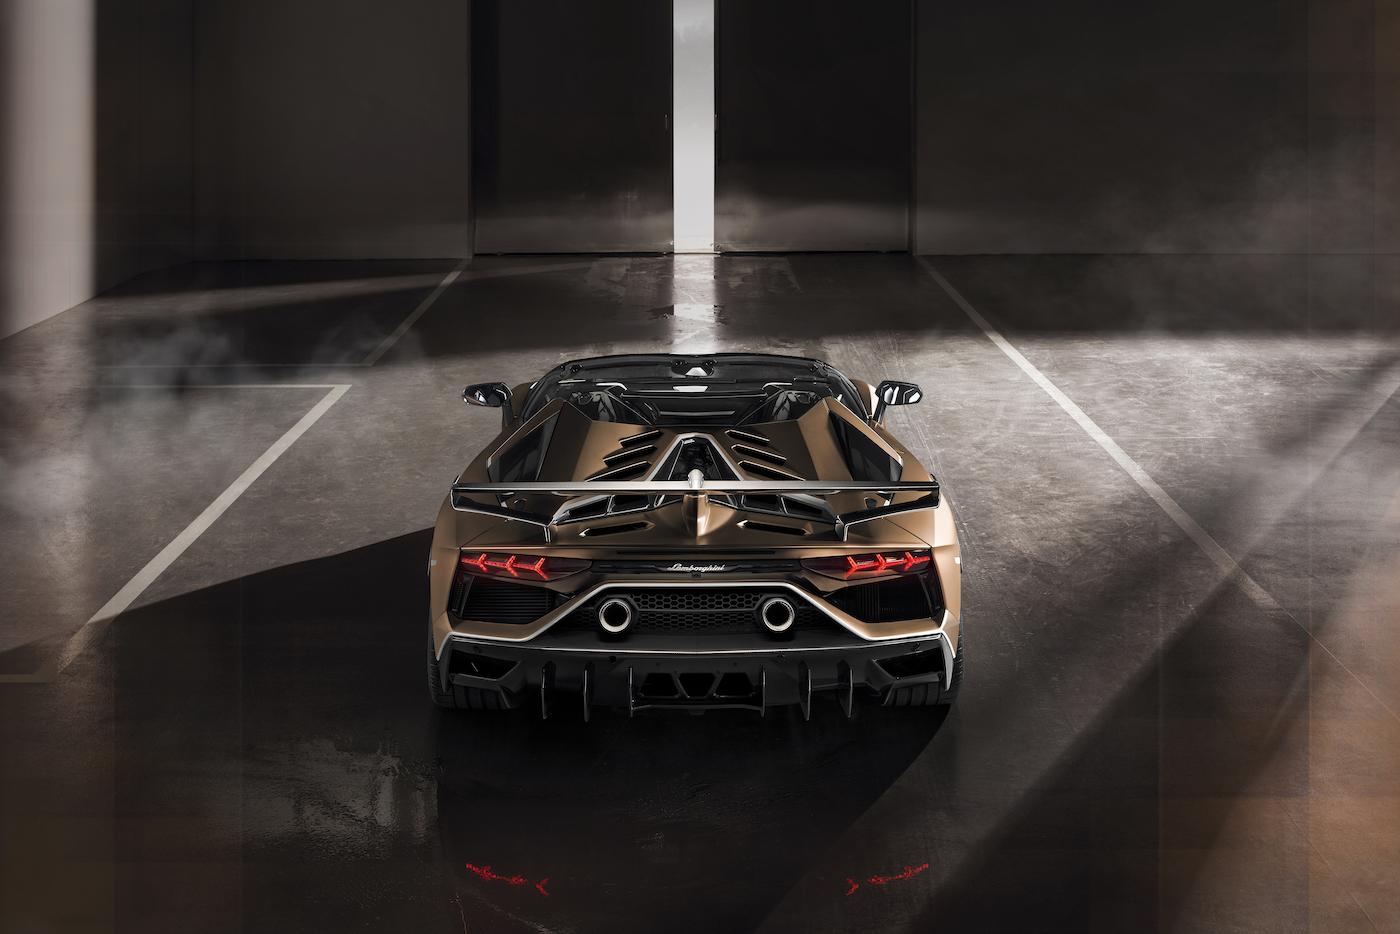 Oben ohne mit 350 km/h: Lamborghini präsentiert den Aventador SVJ Roadster in Genf 13